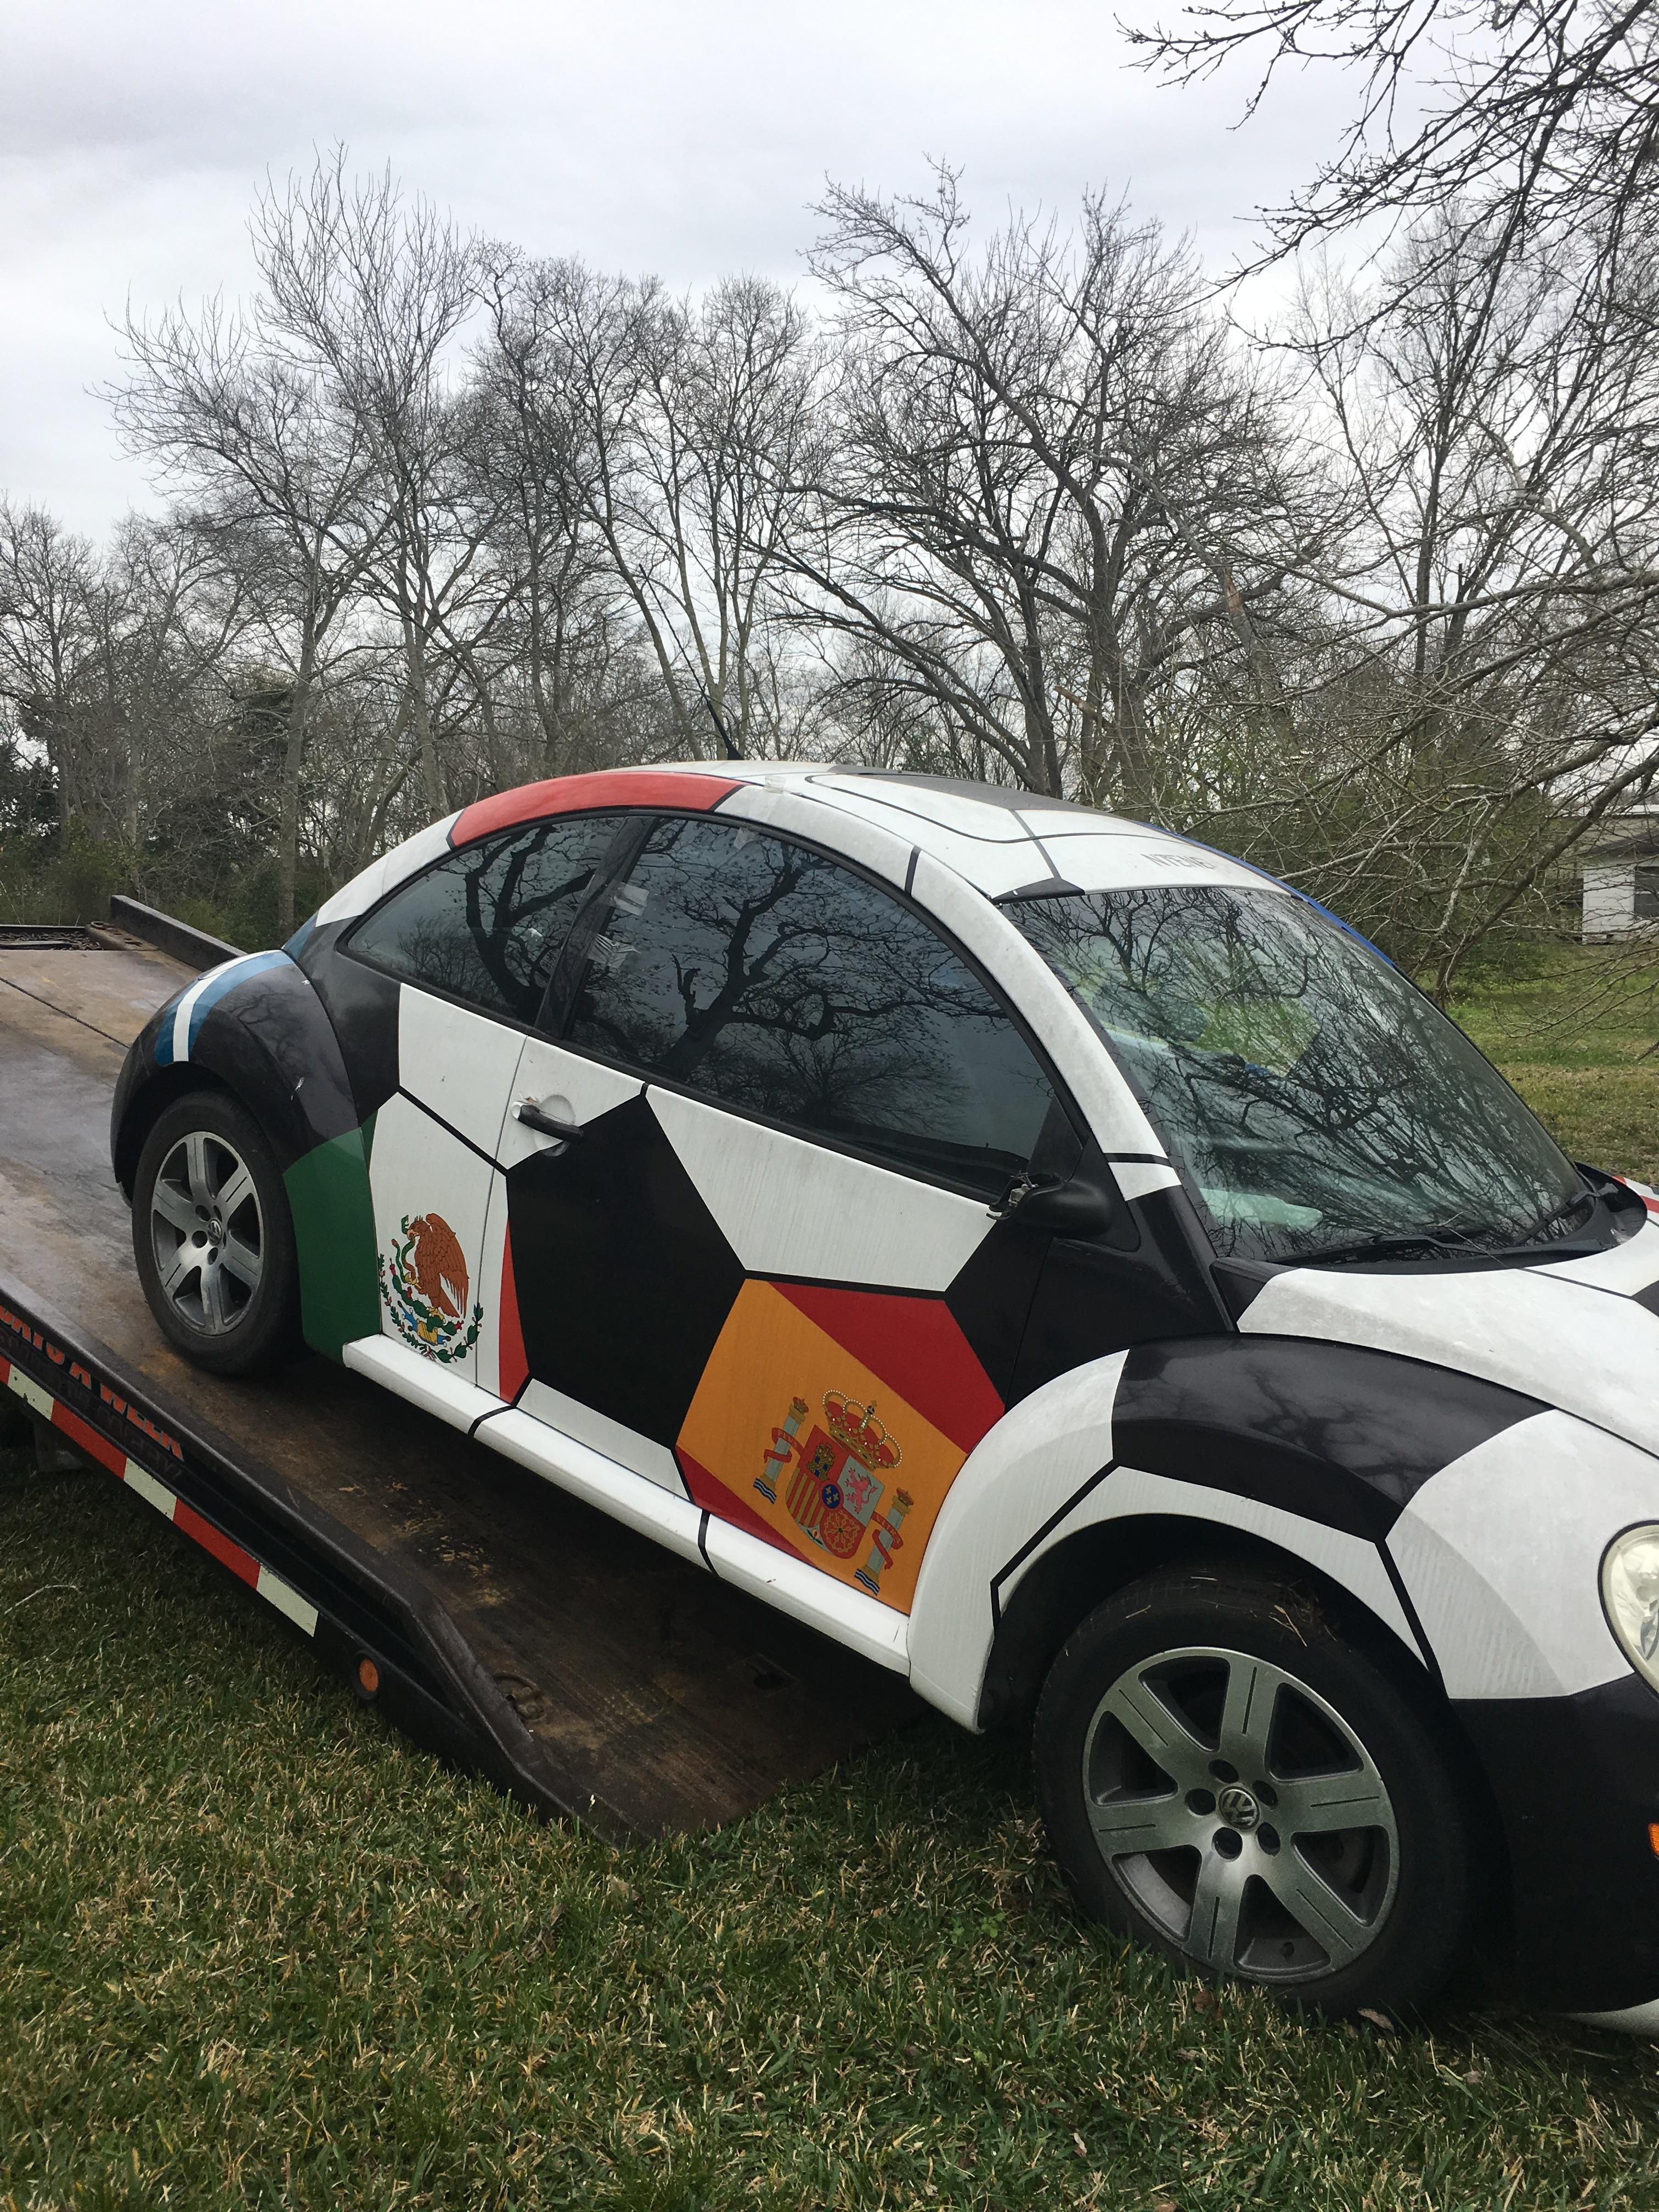 Easy Cash For Junk Cars image 14